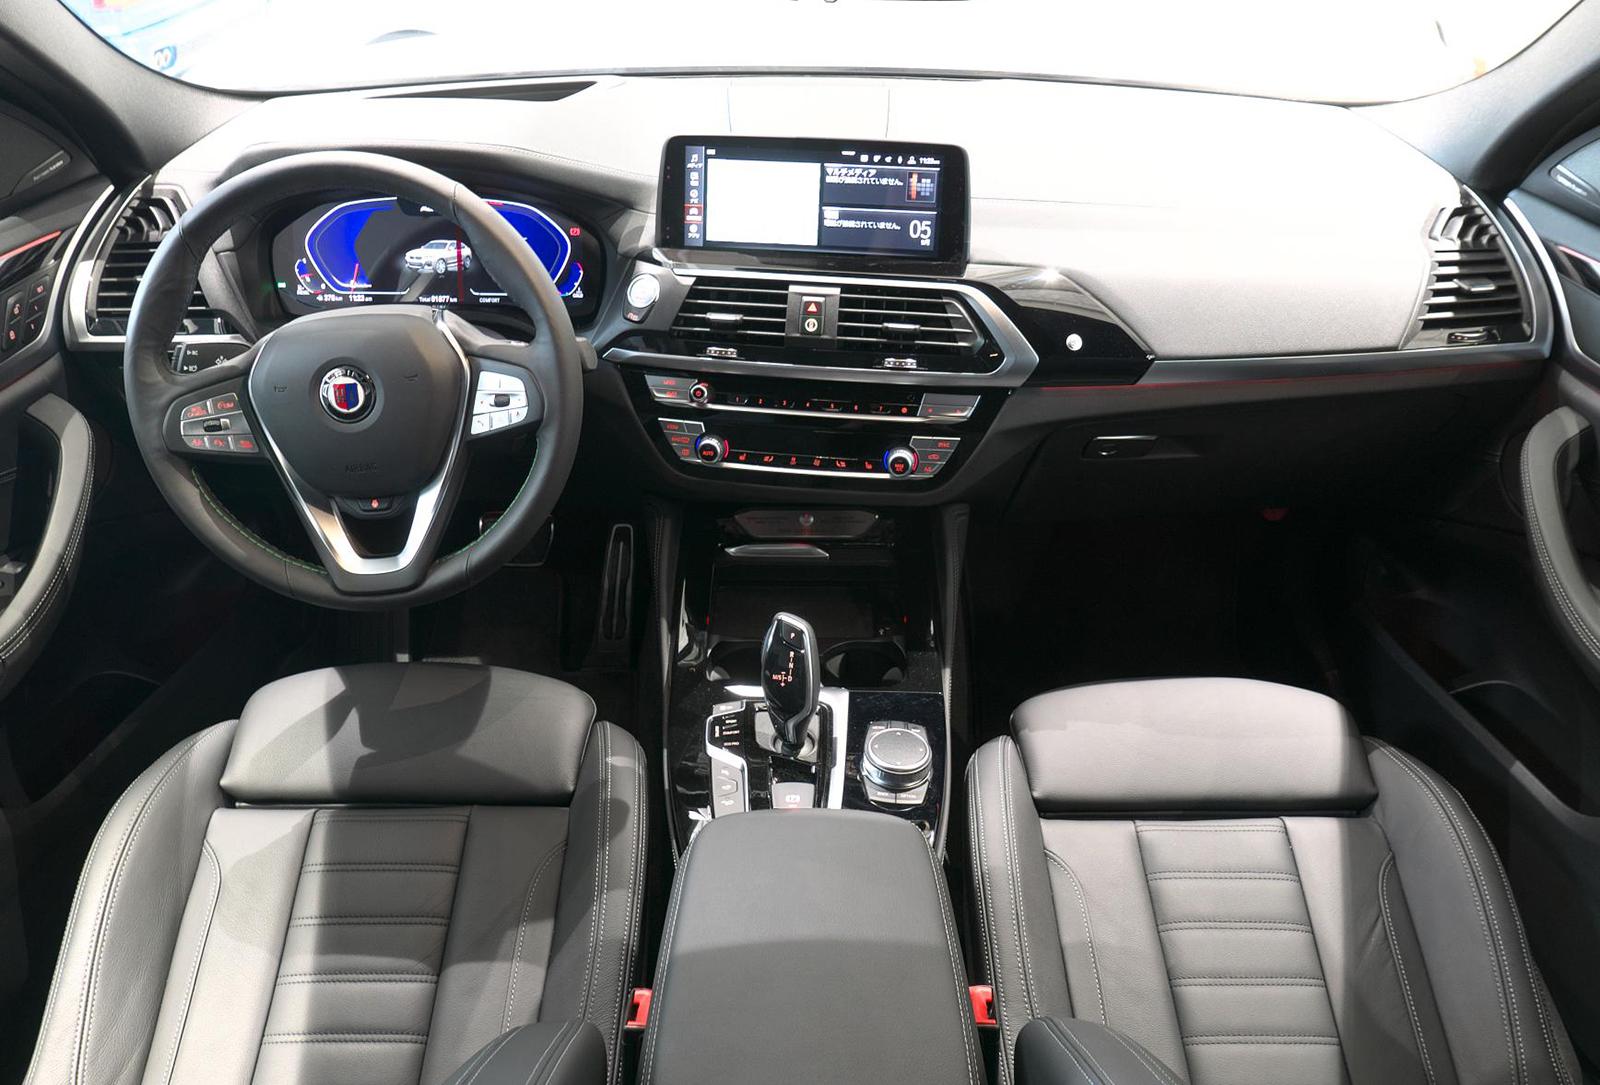 BMW アルピナ XD4 Allrad 内装